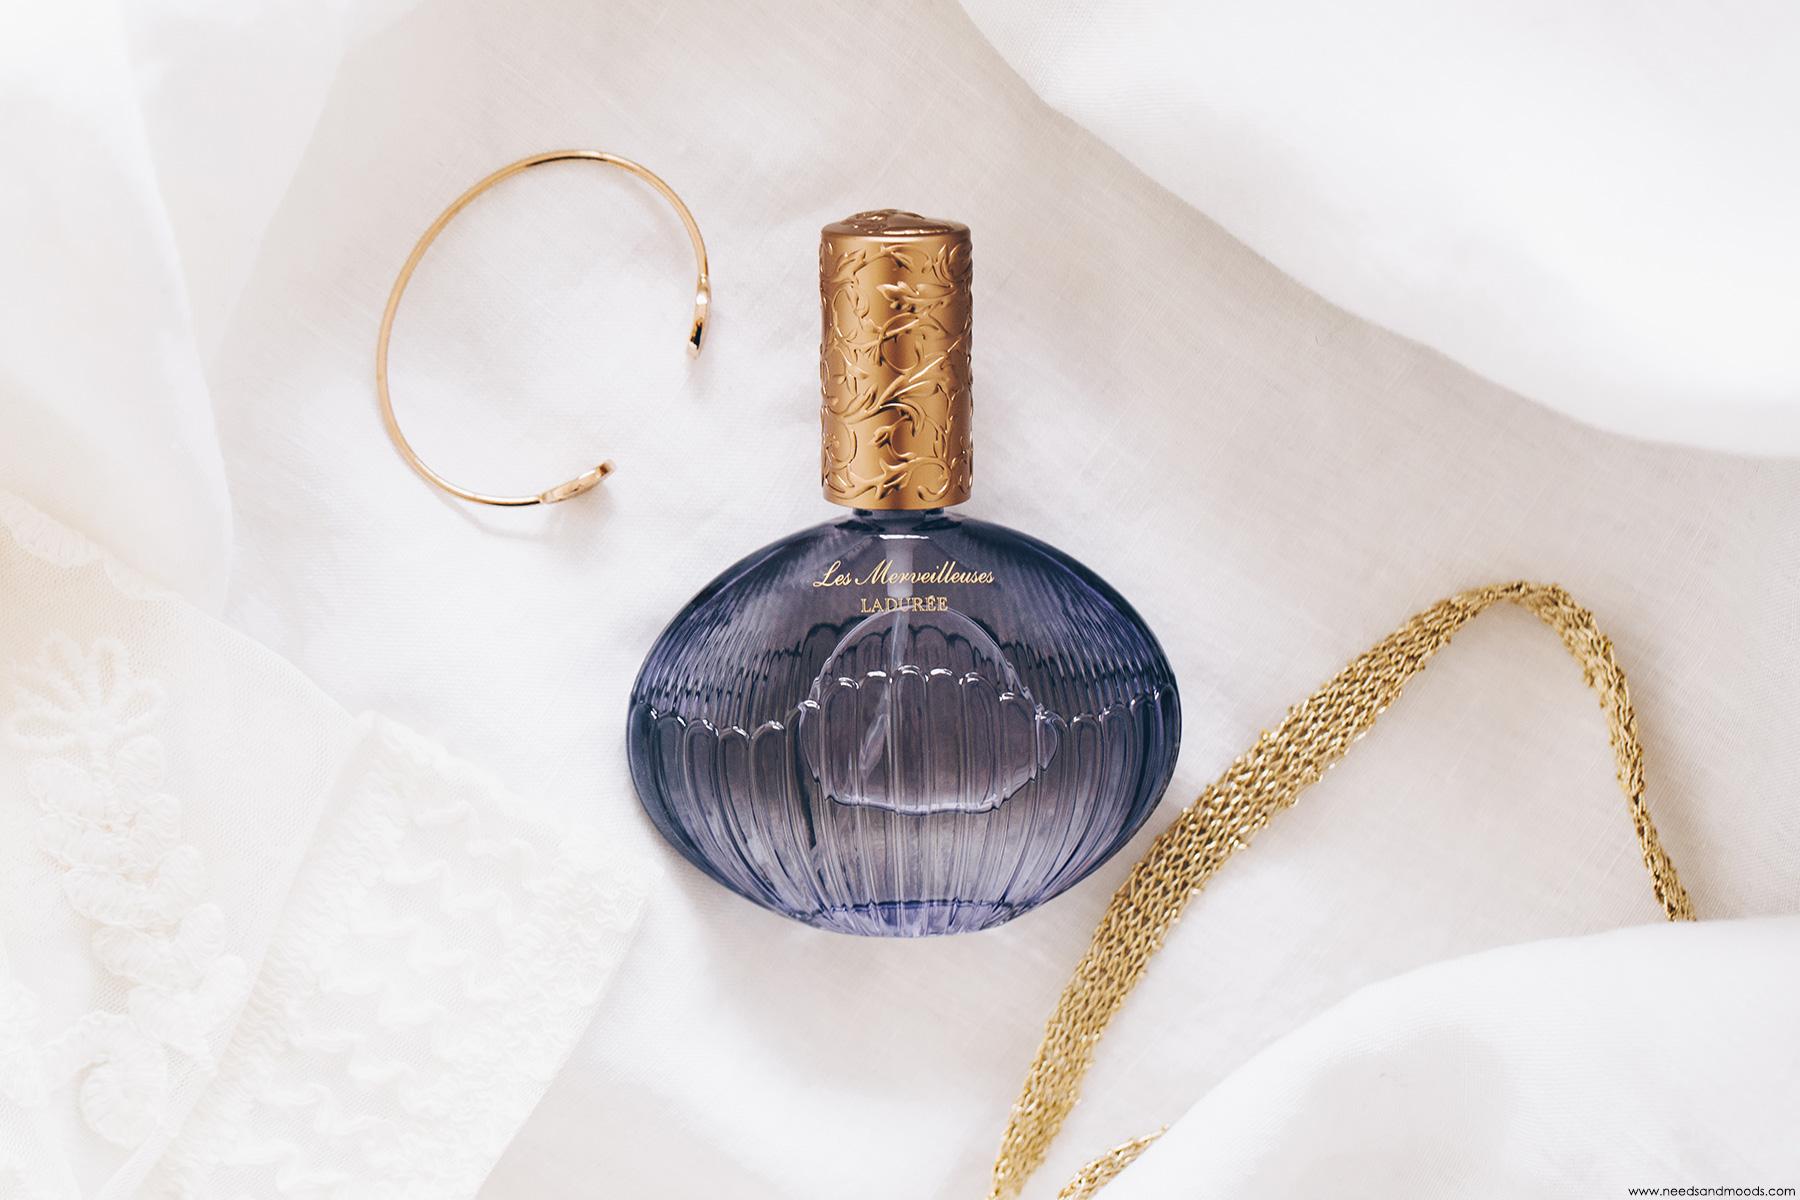 parfum les merveilleuses laduree